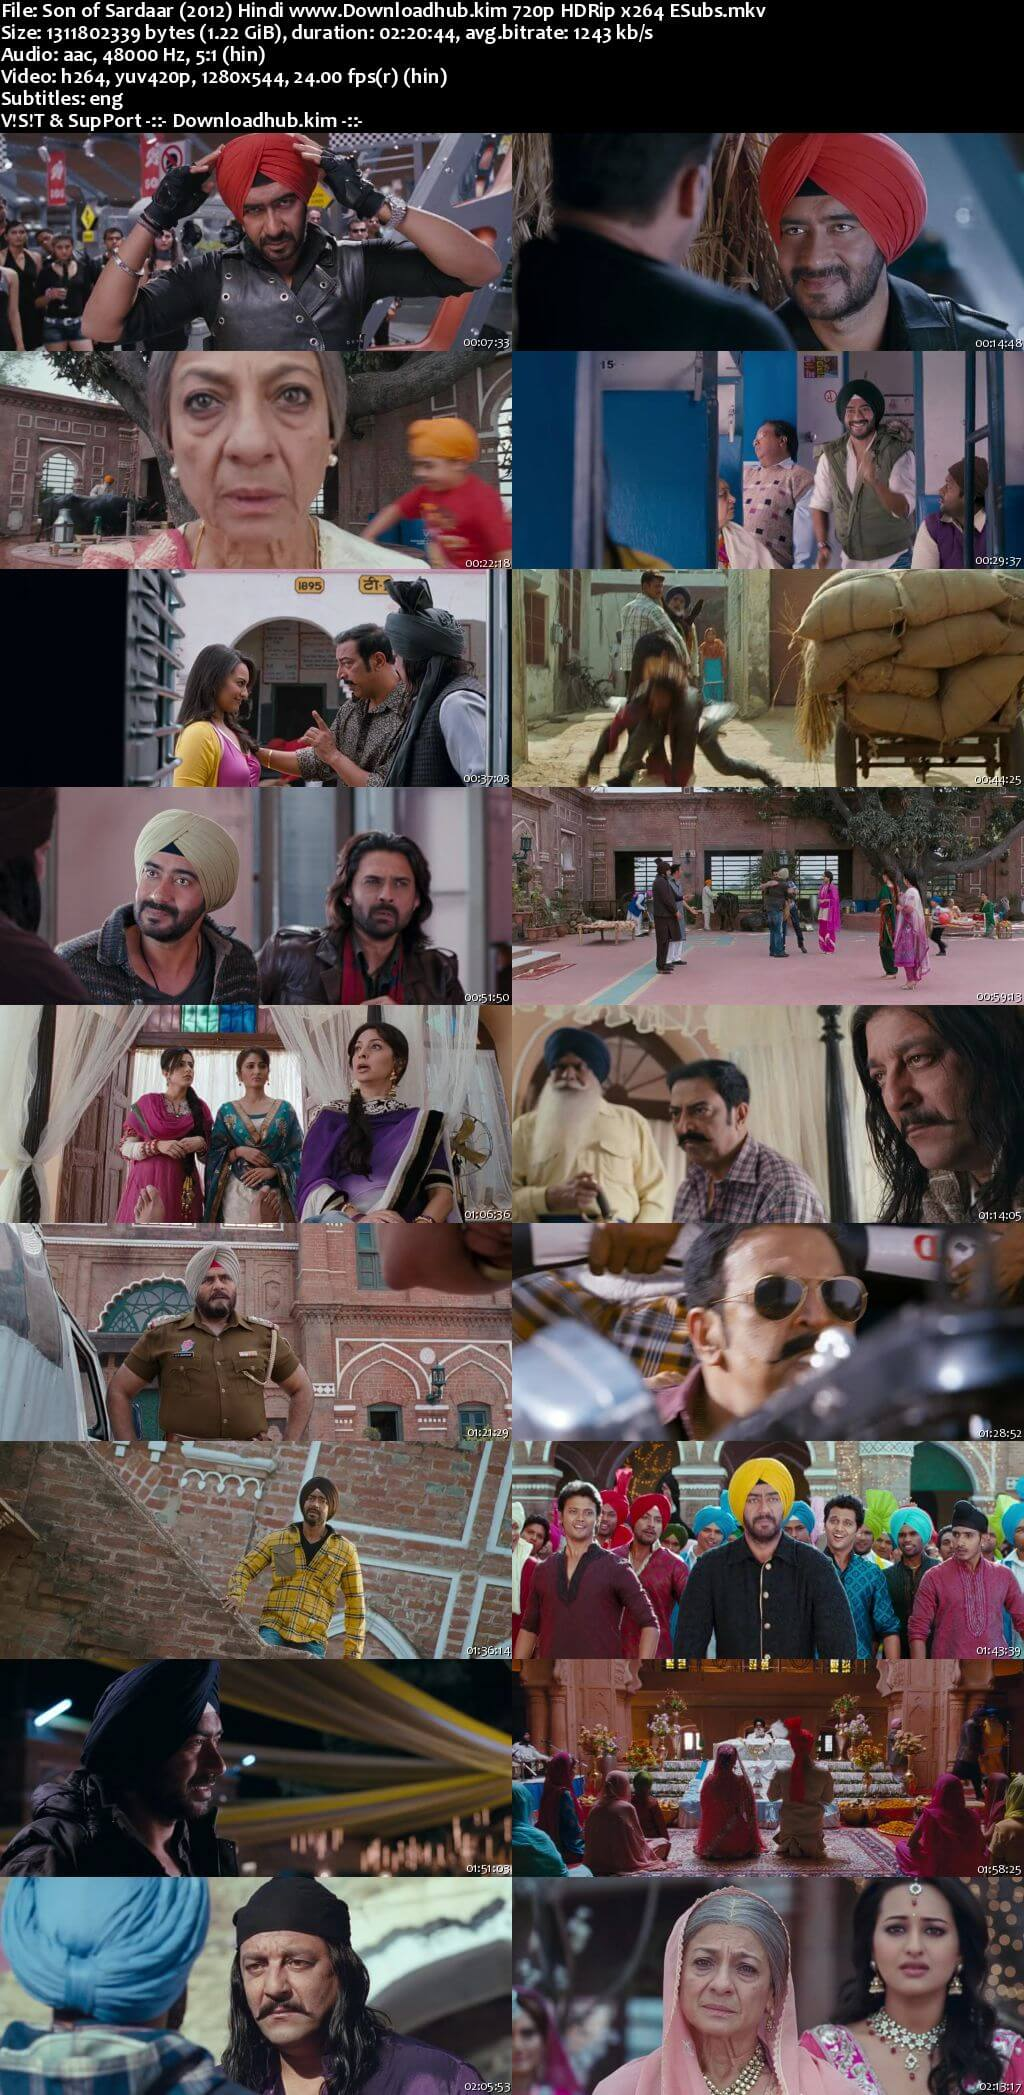 Son of Sardaar 2012 Hindi 720p HDRip ESubs